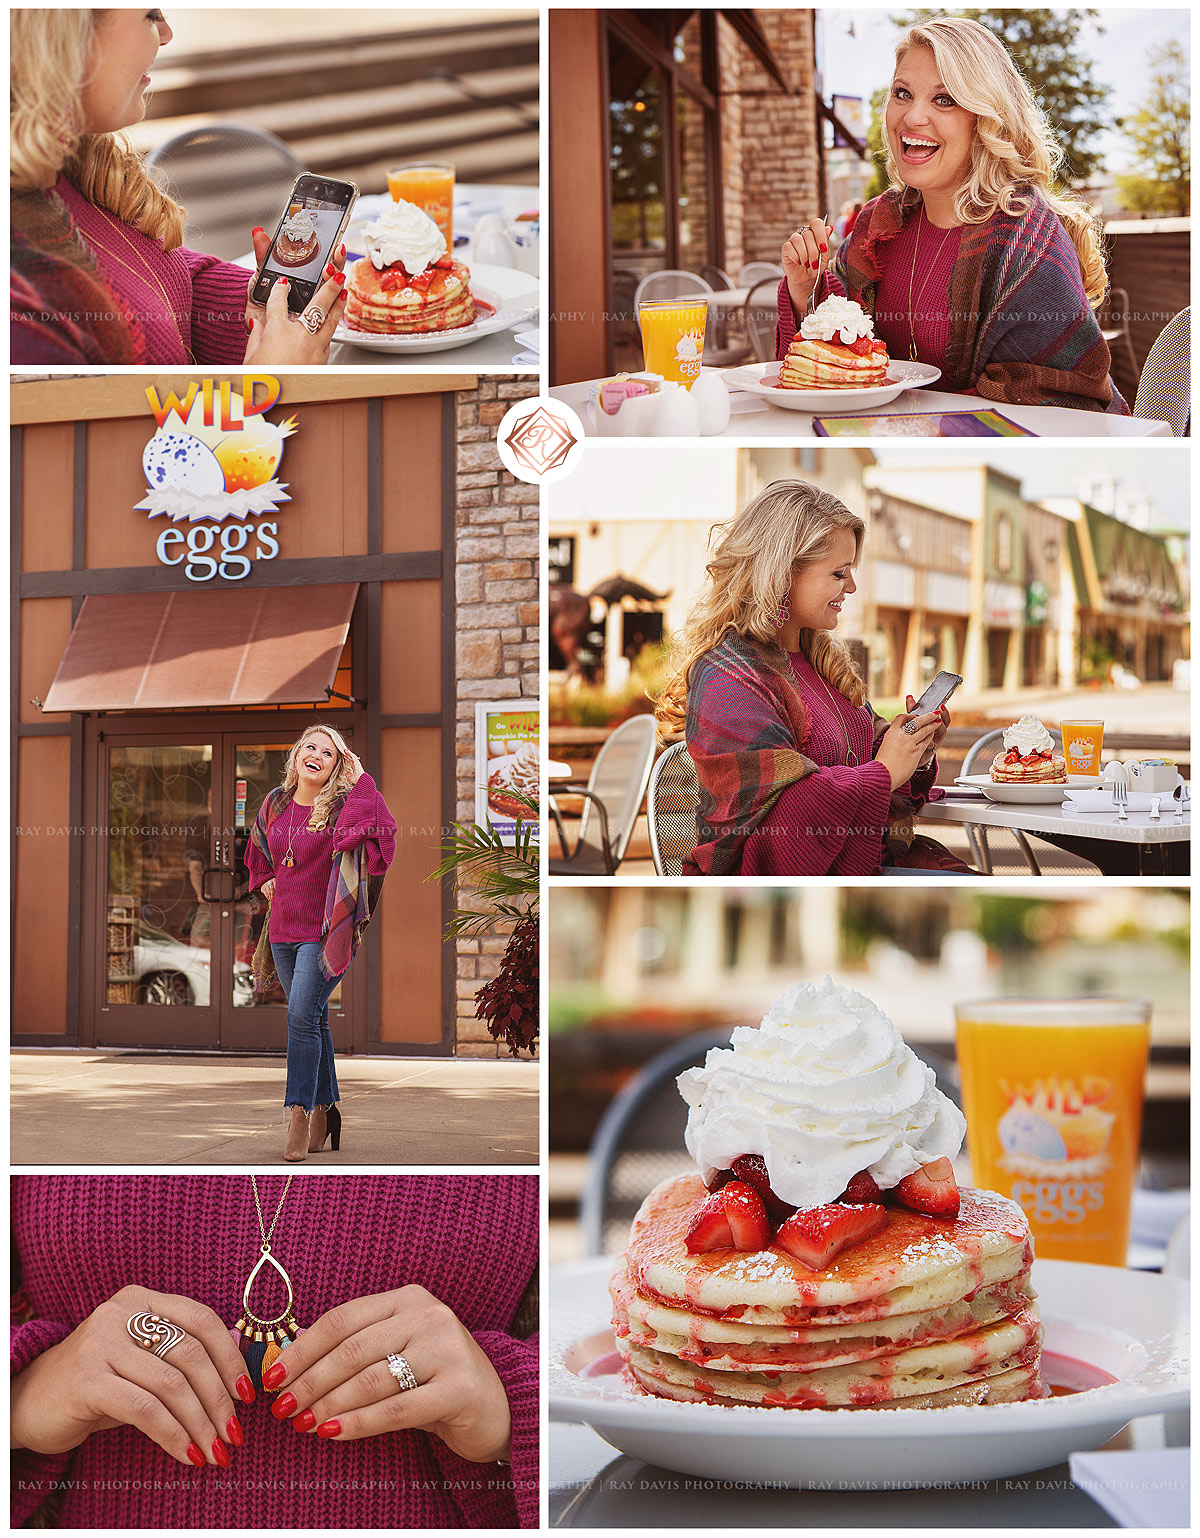 Instagram Influencer of @eatlovelouisville enjoys eating pancakes at Wild Eggs in Westport Village